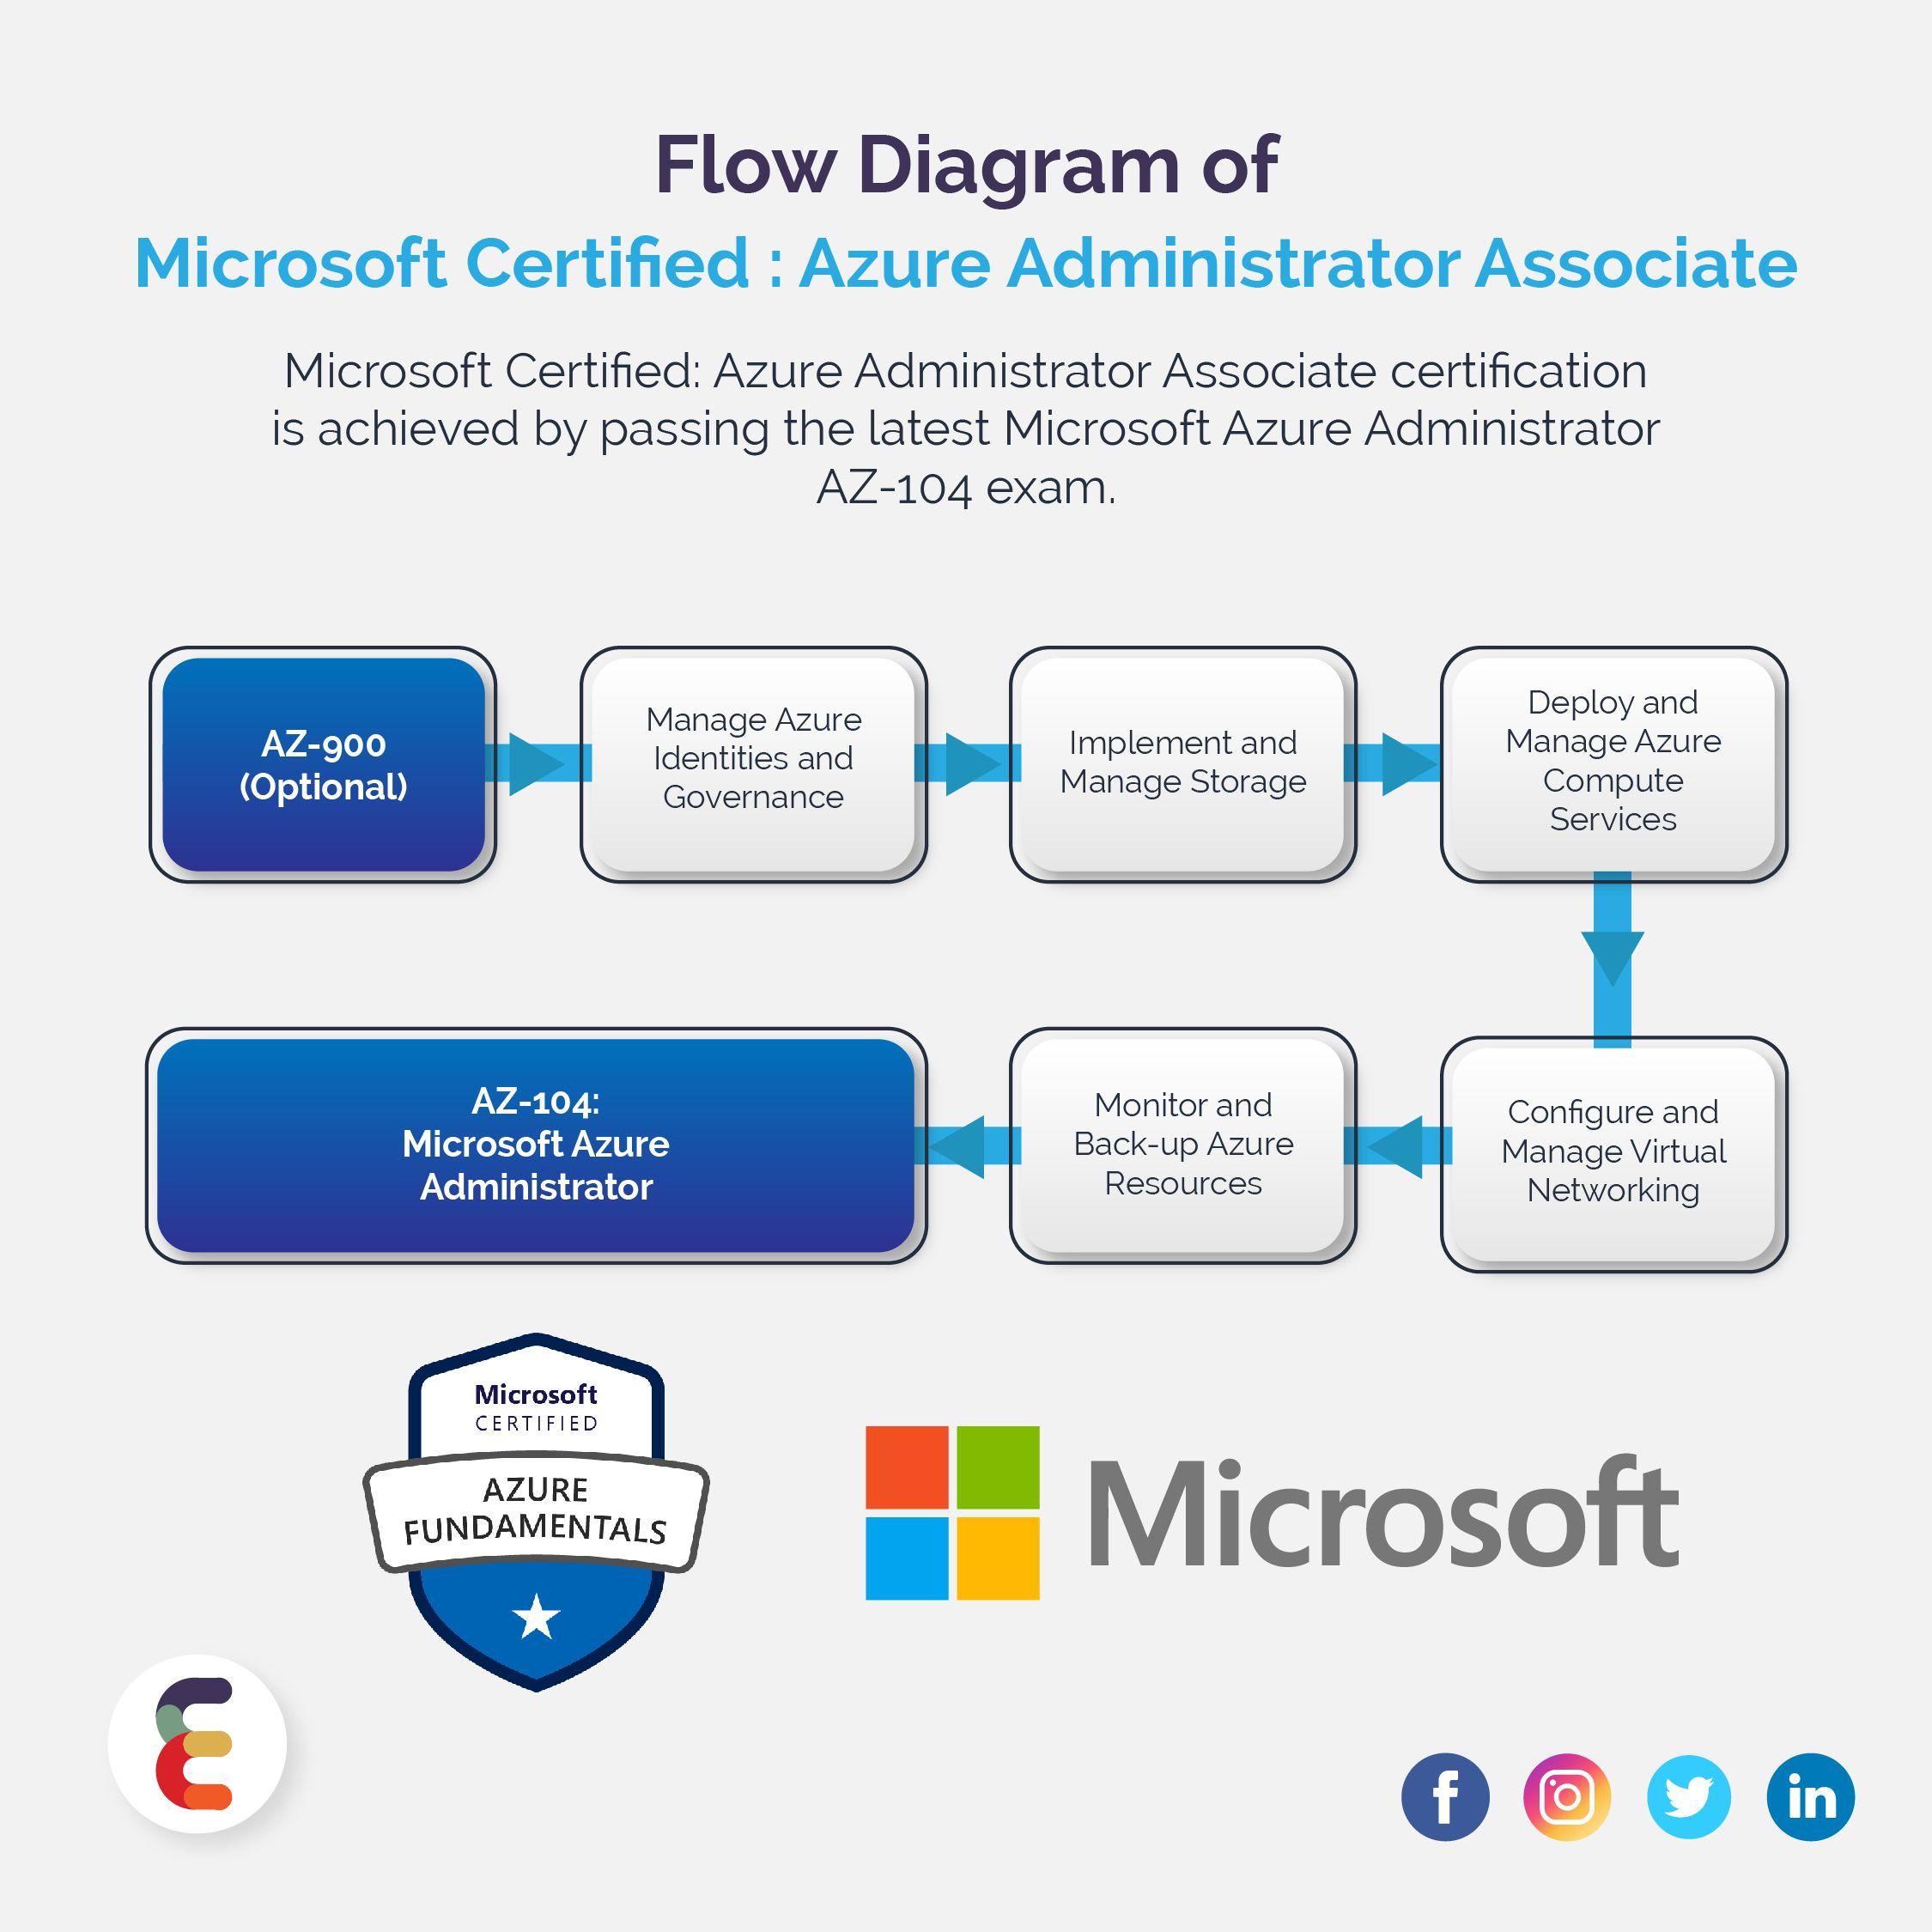 Flow Diagram Of Microsoft Certified Azure Fundamentals Cloud Computing Services Azure Microsoft